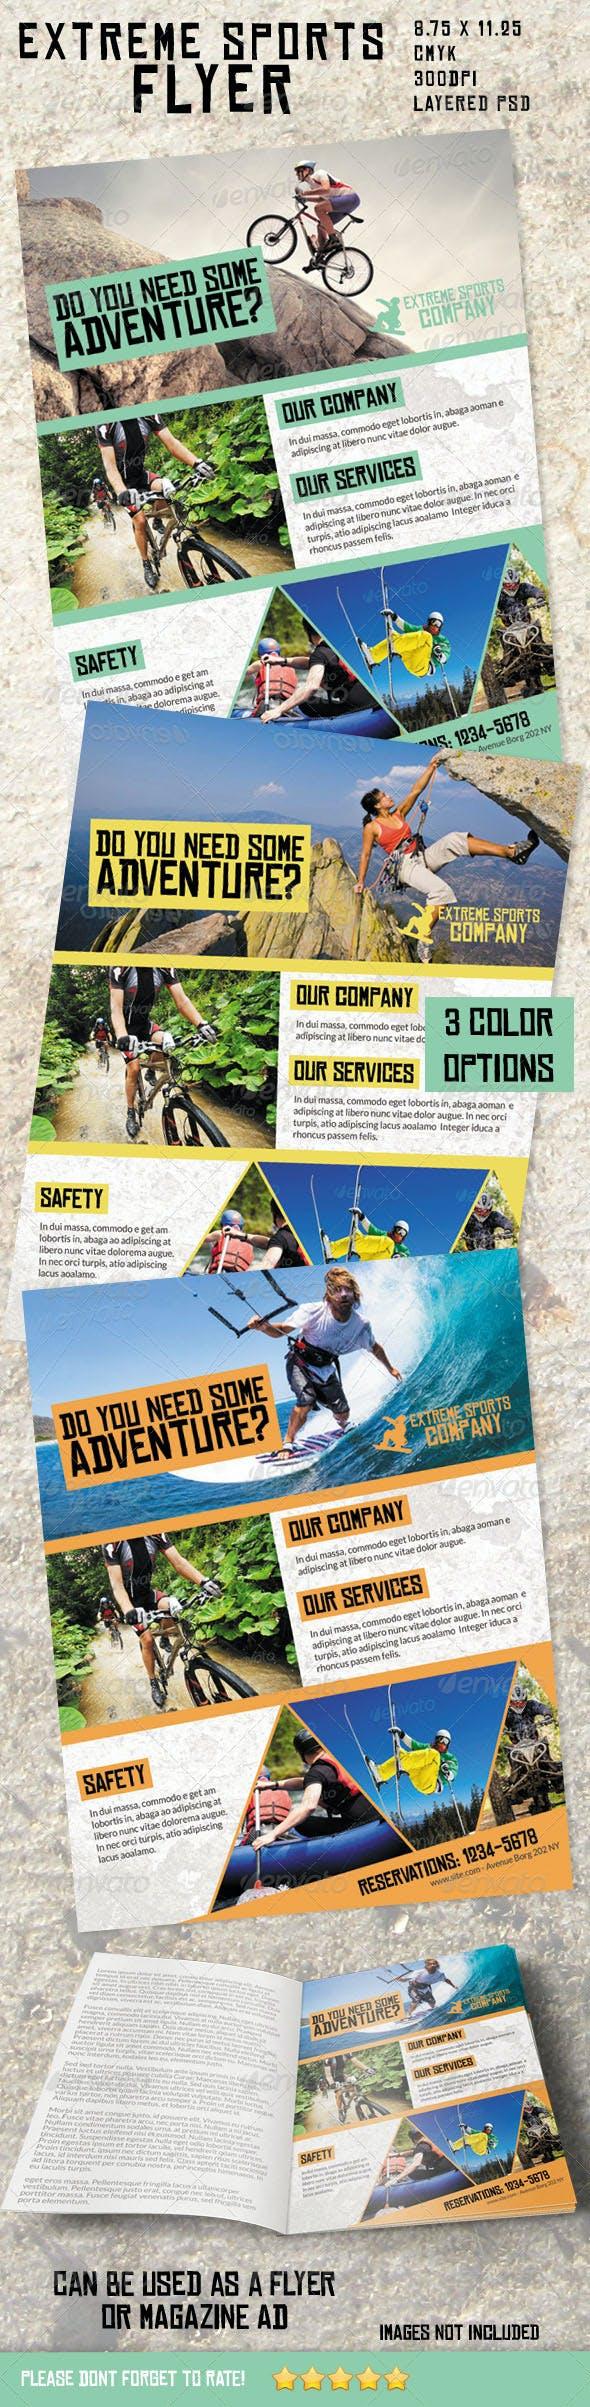 extreme sports flyer magazine ad by ingridk graphicriver. Black Bedroom Furniture Sets. Home Design Ideas